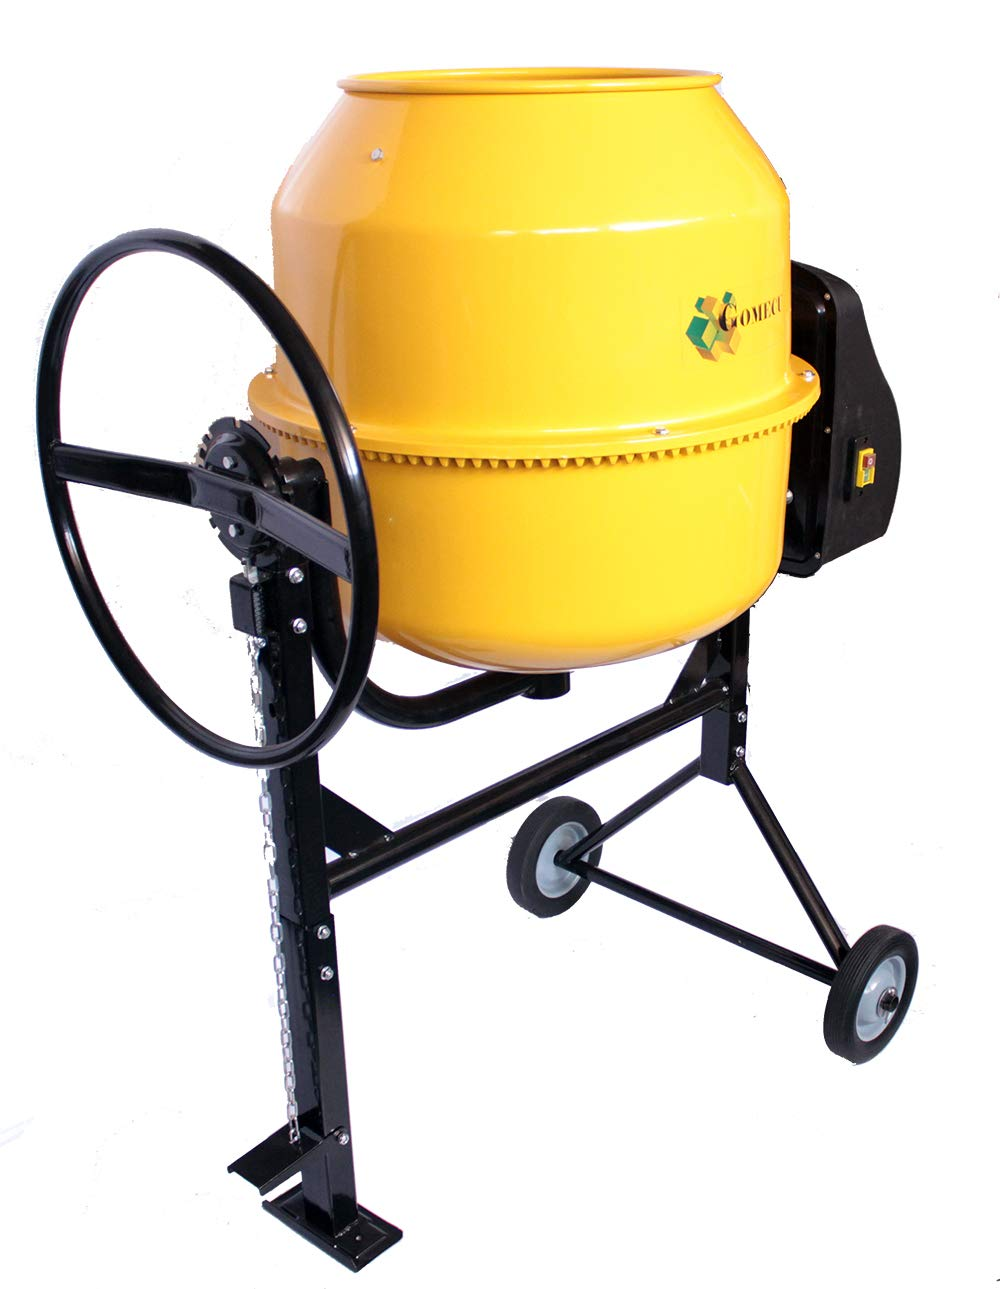 Hormigonera Electrica 185 Litros CM185 800W Pedal de Fijaci/ón con Pi/ñon Hierro